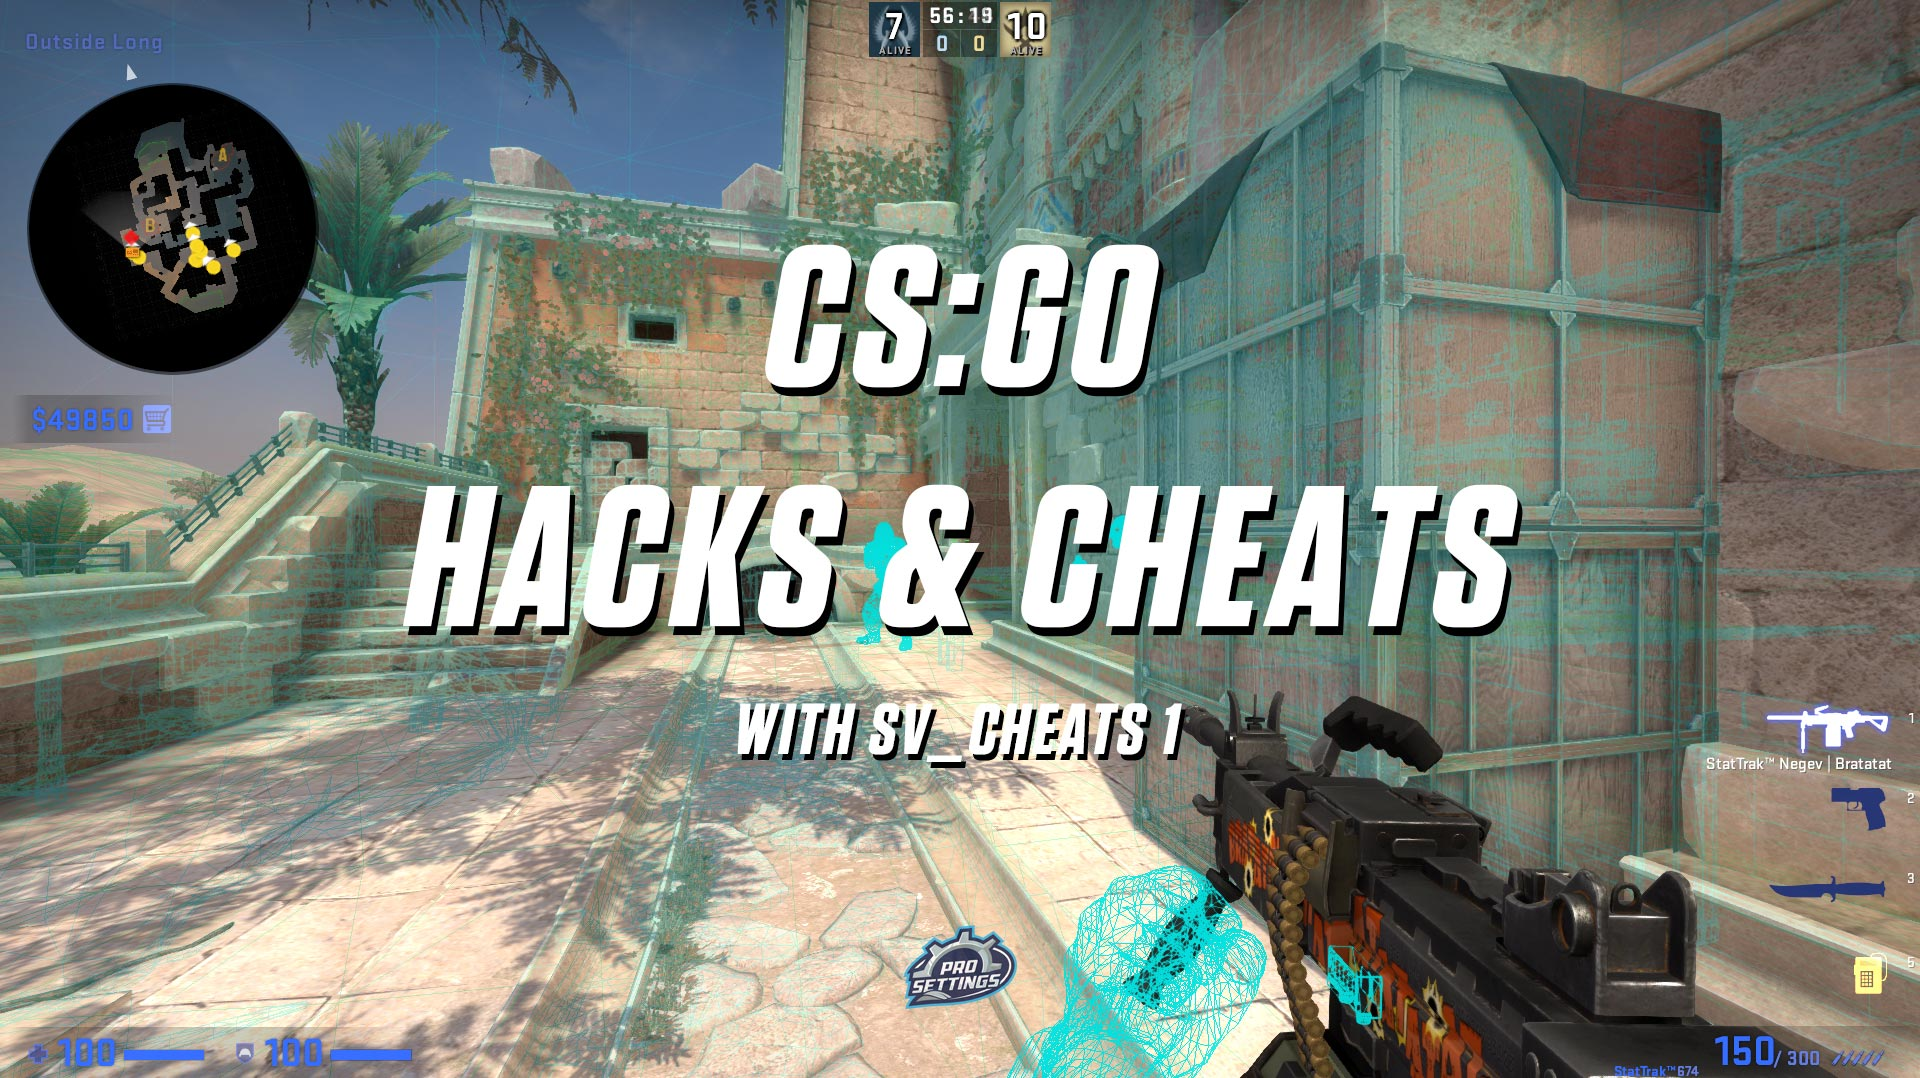 csgo hacks sv cheats1 - Download CS:GO Hacks & Cheats with sv_cheats 1 for FREE - Free Game Hacks